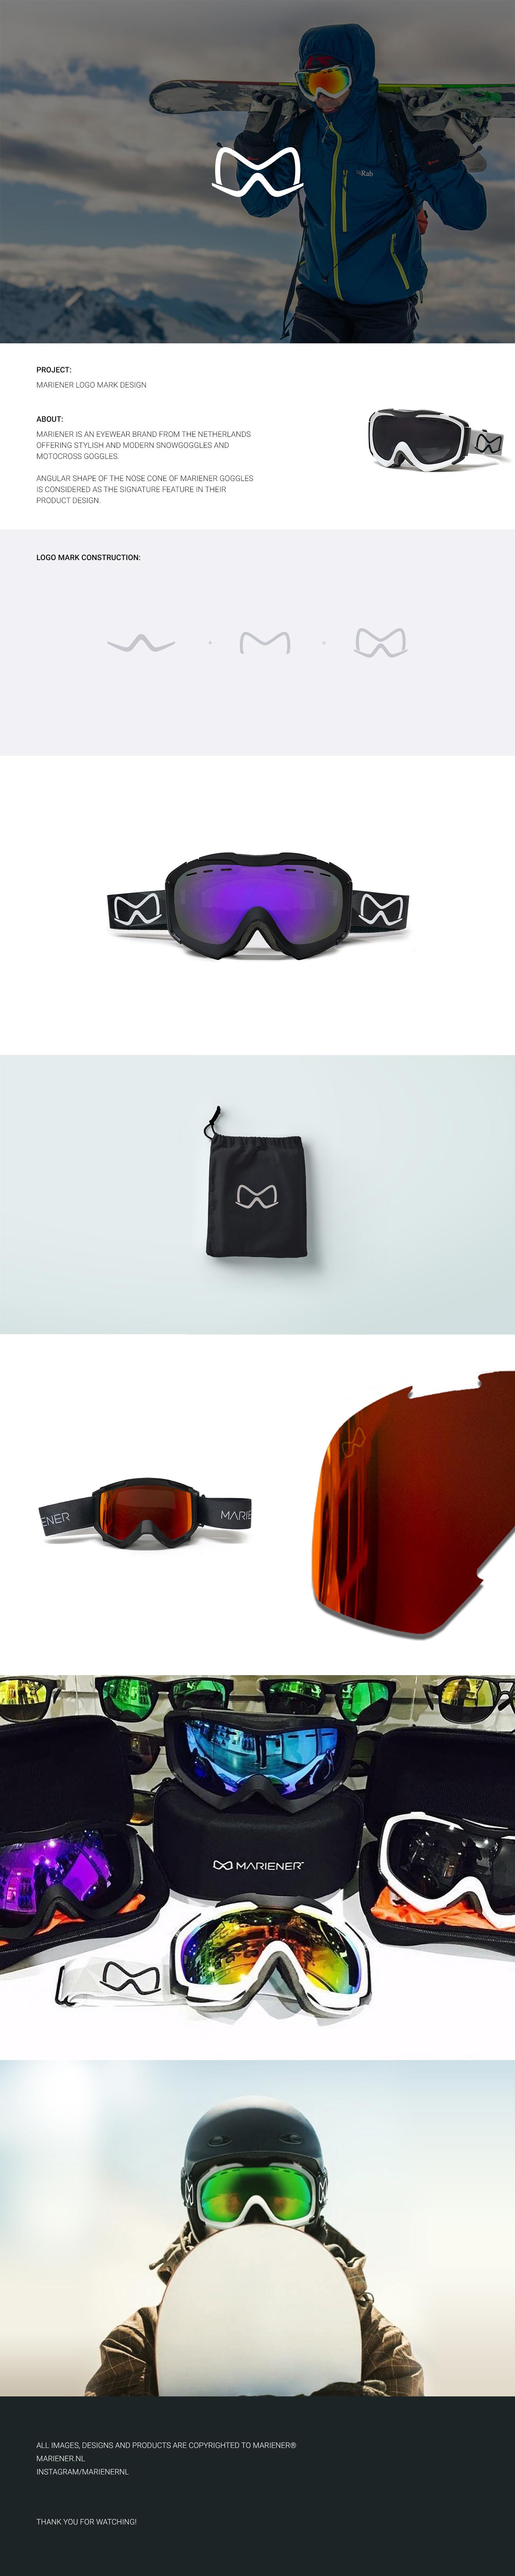 mariener Sunglasses goggles snow Motocross lettermark simple minimal Netherlands